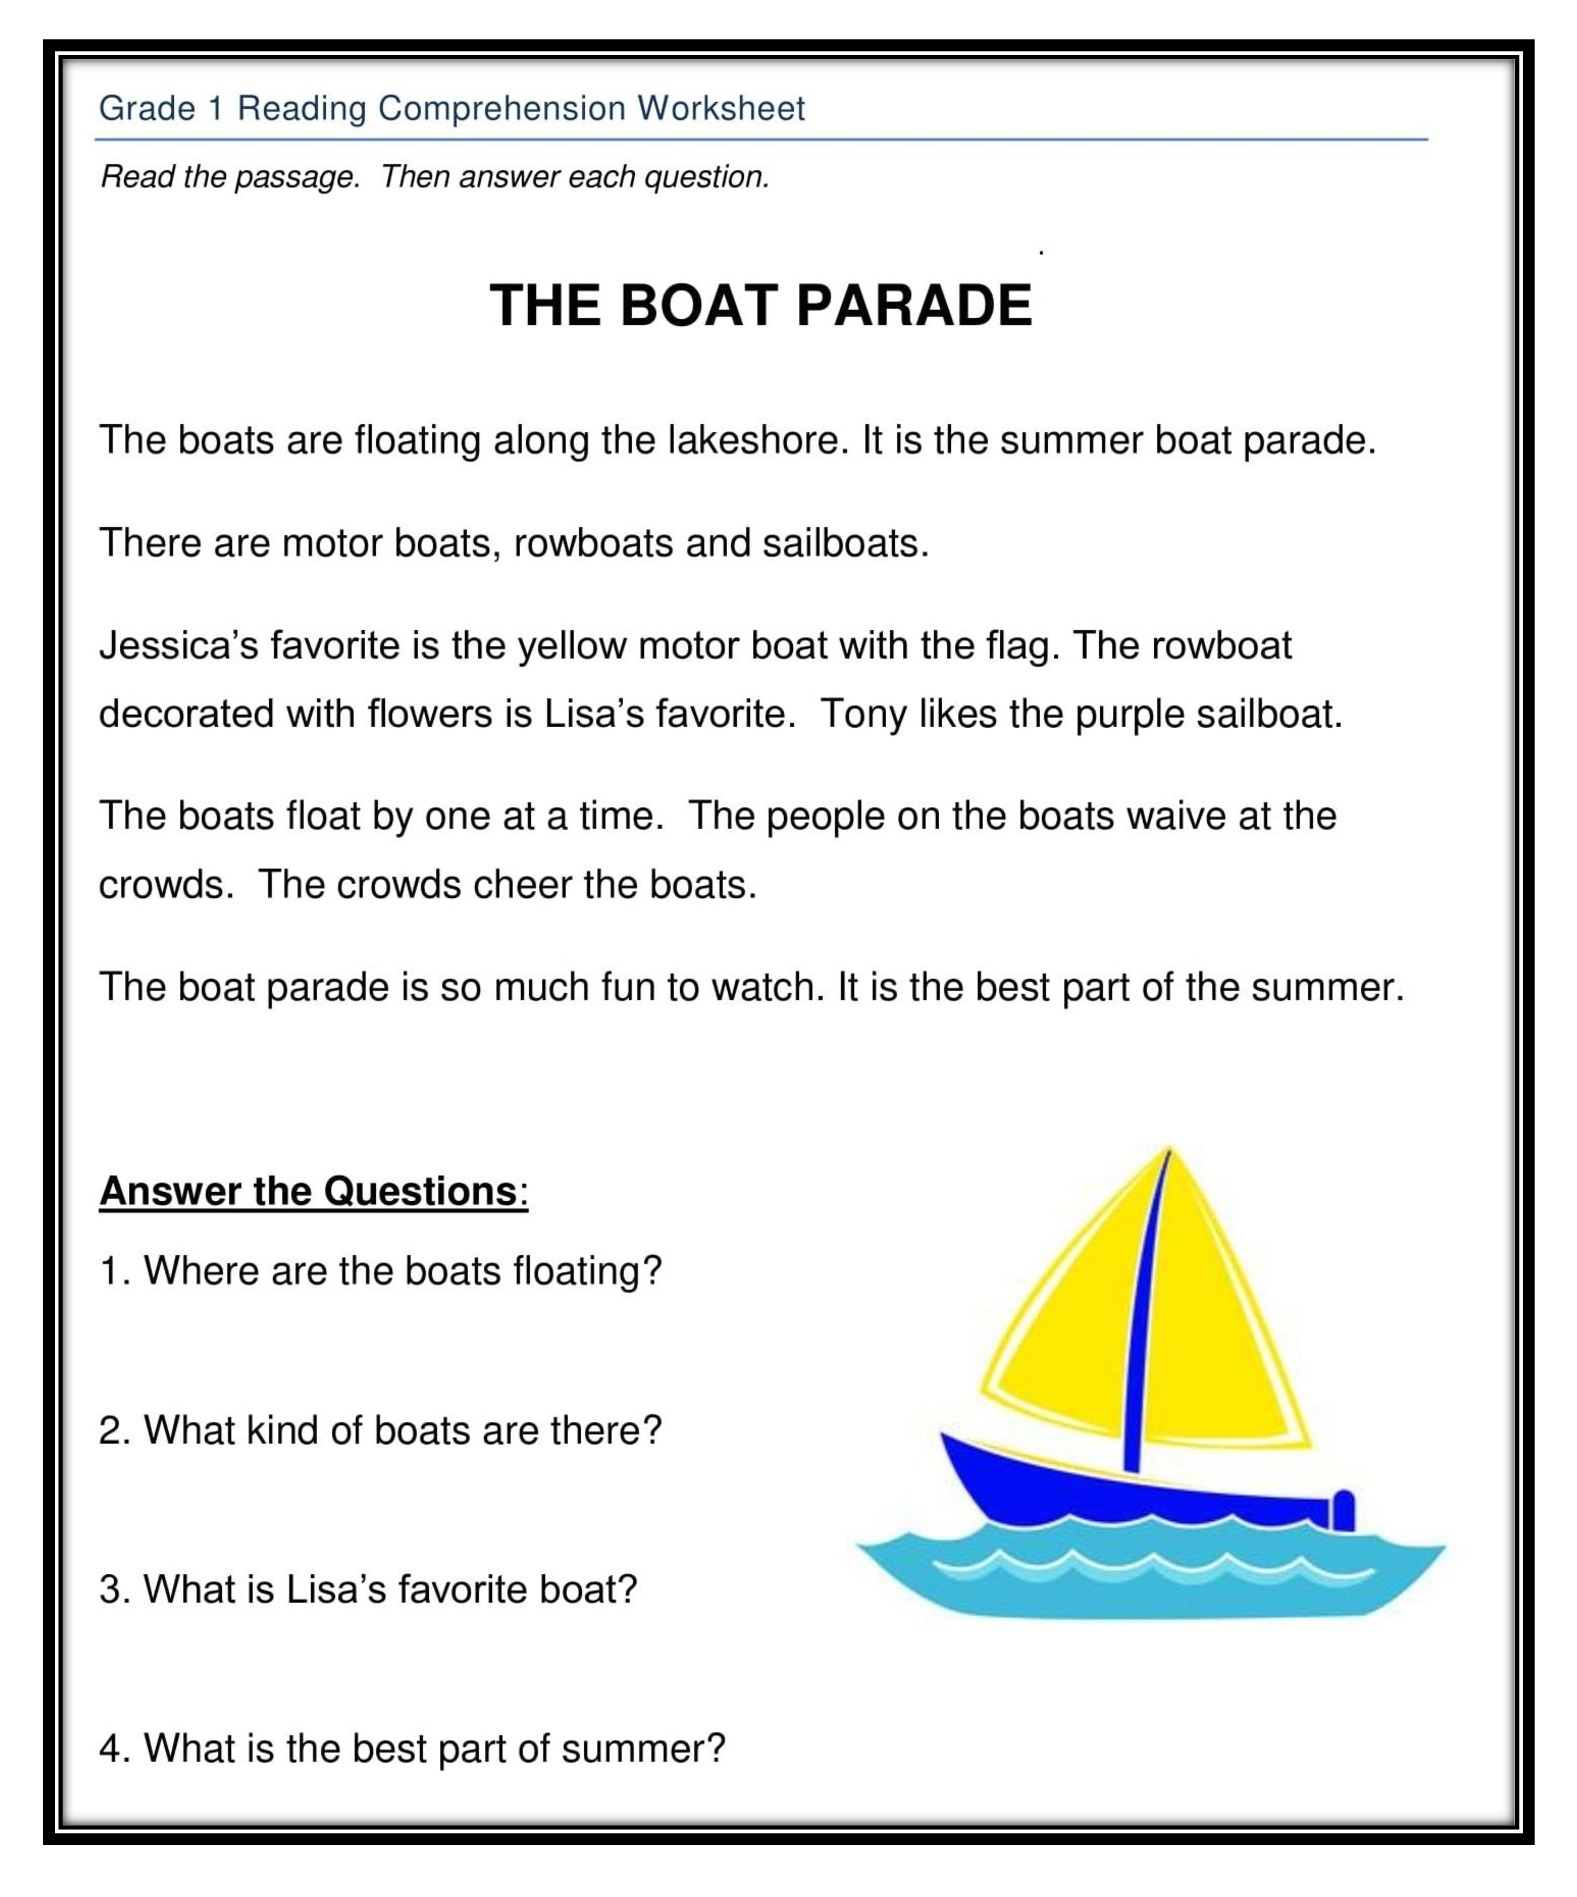 Grade 1 Reading Worksheet